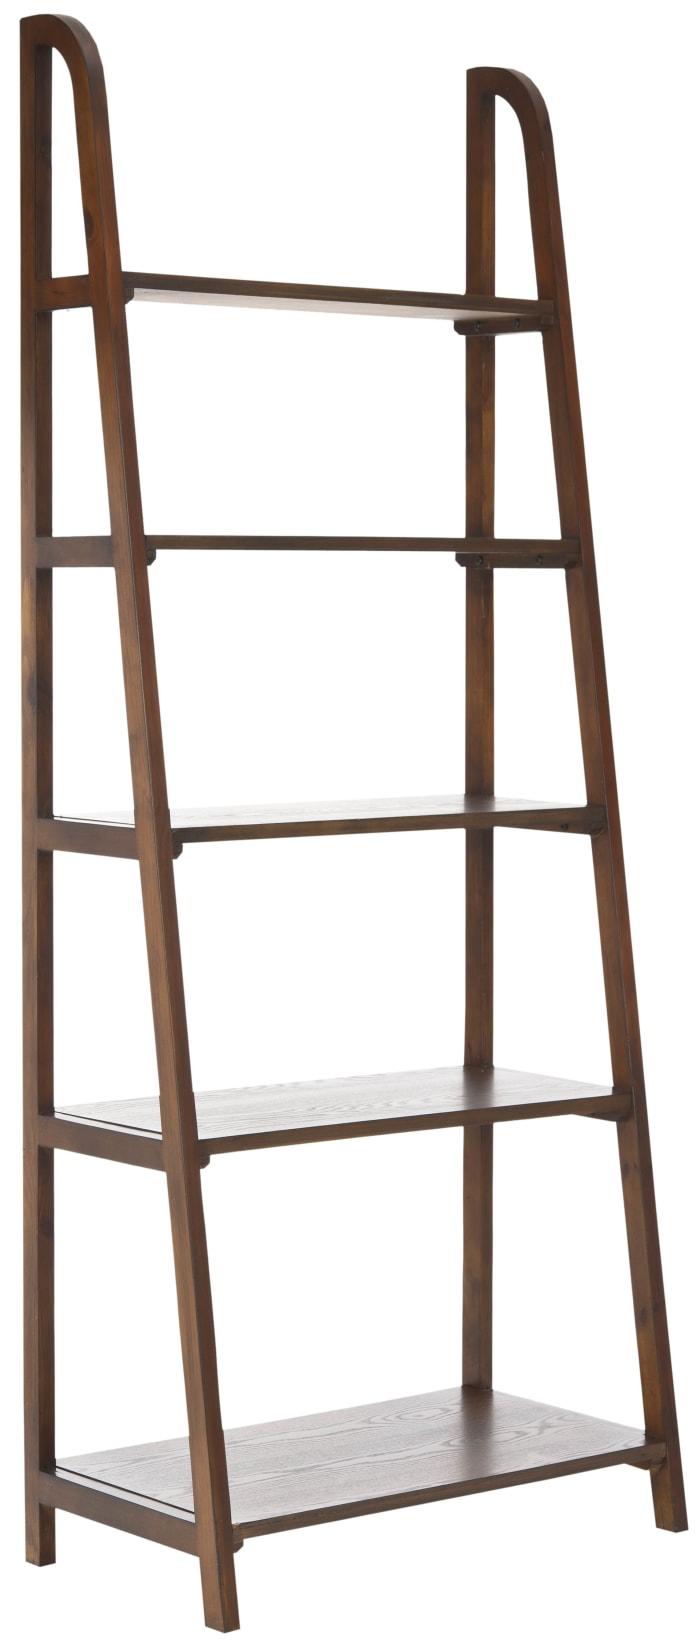 Weston Natural 5-Tier Shelf